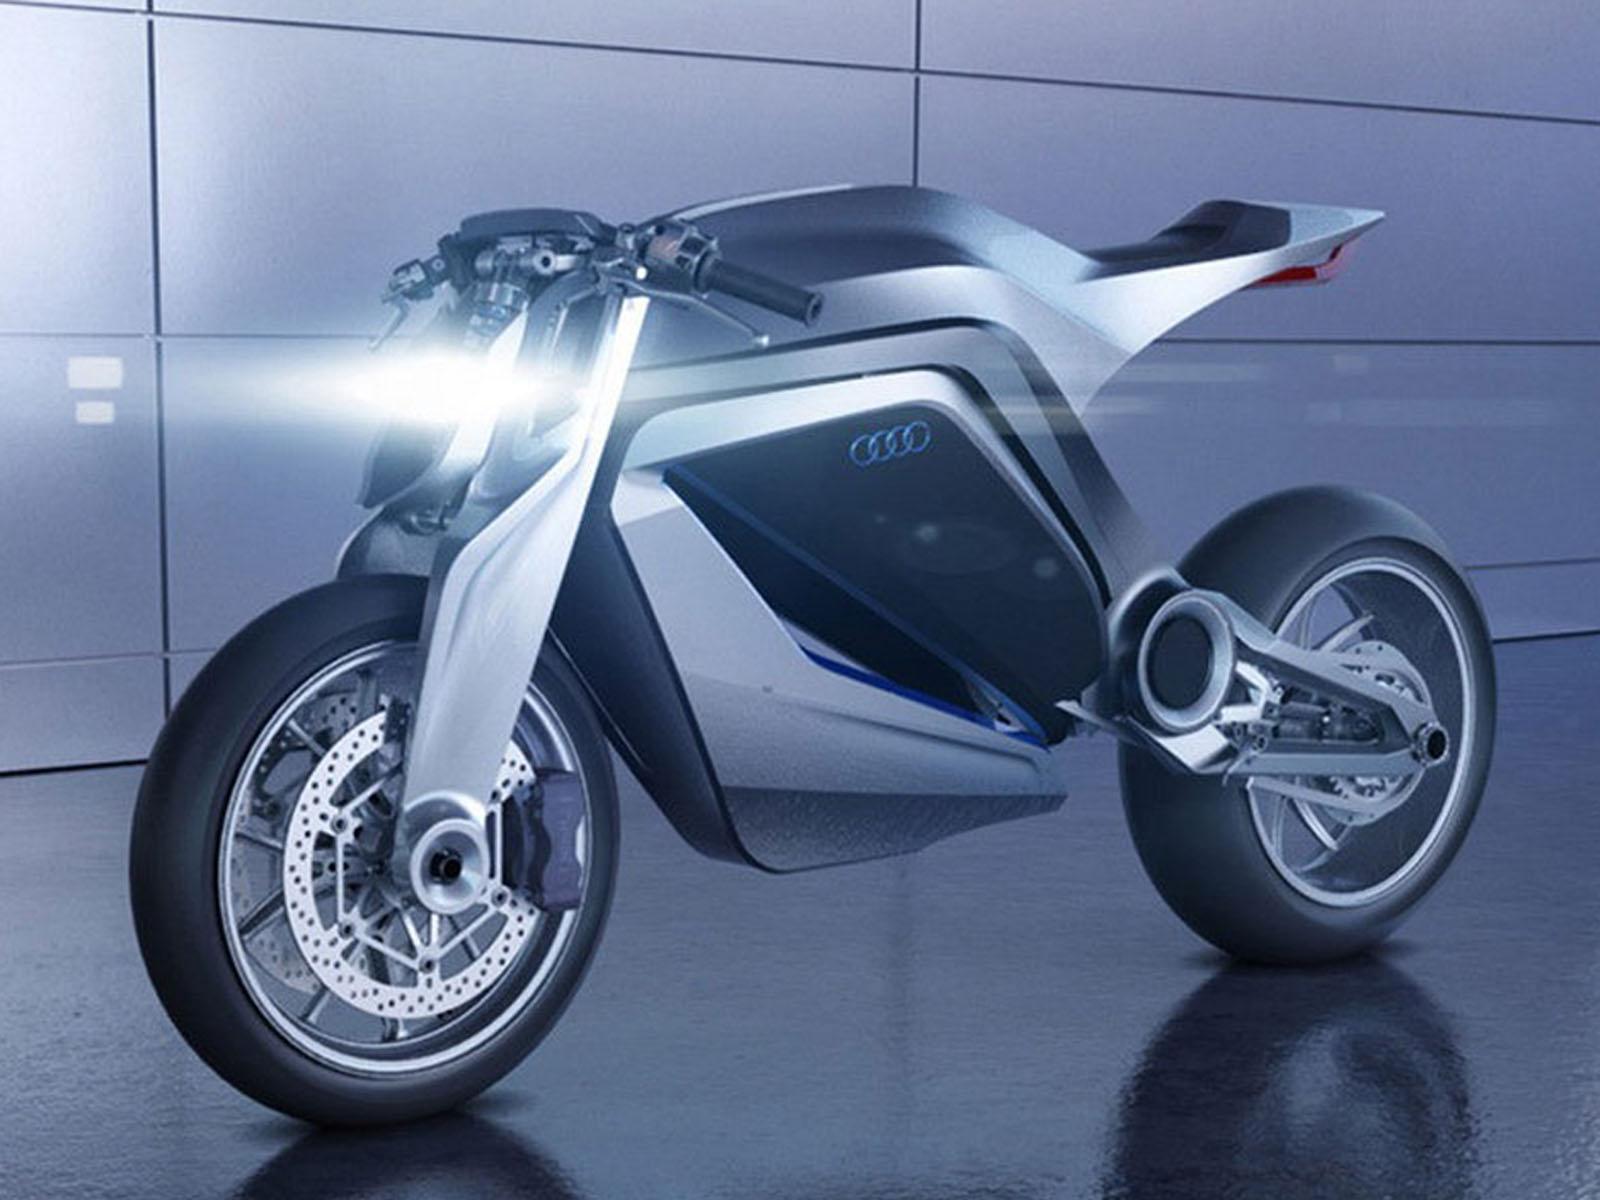 Audi Motorrad Concept As 237 Podr 237 A Lucir Una Motocicleta De